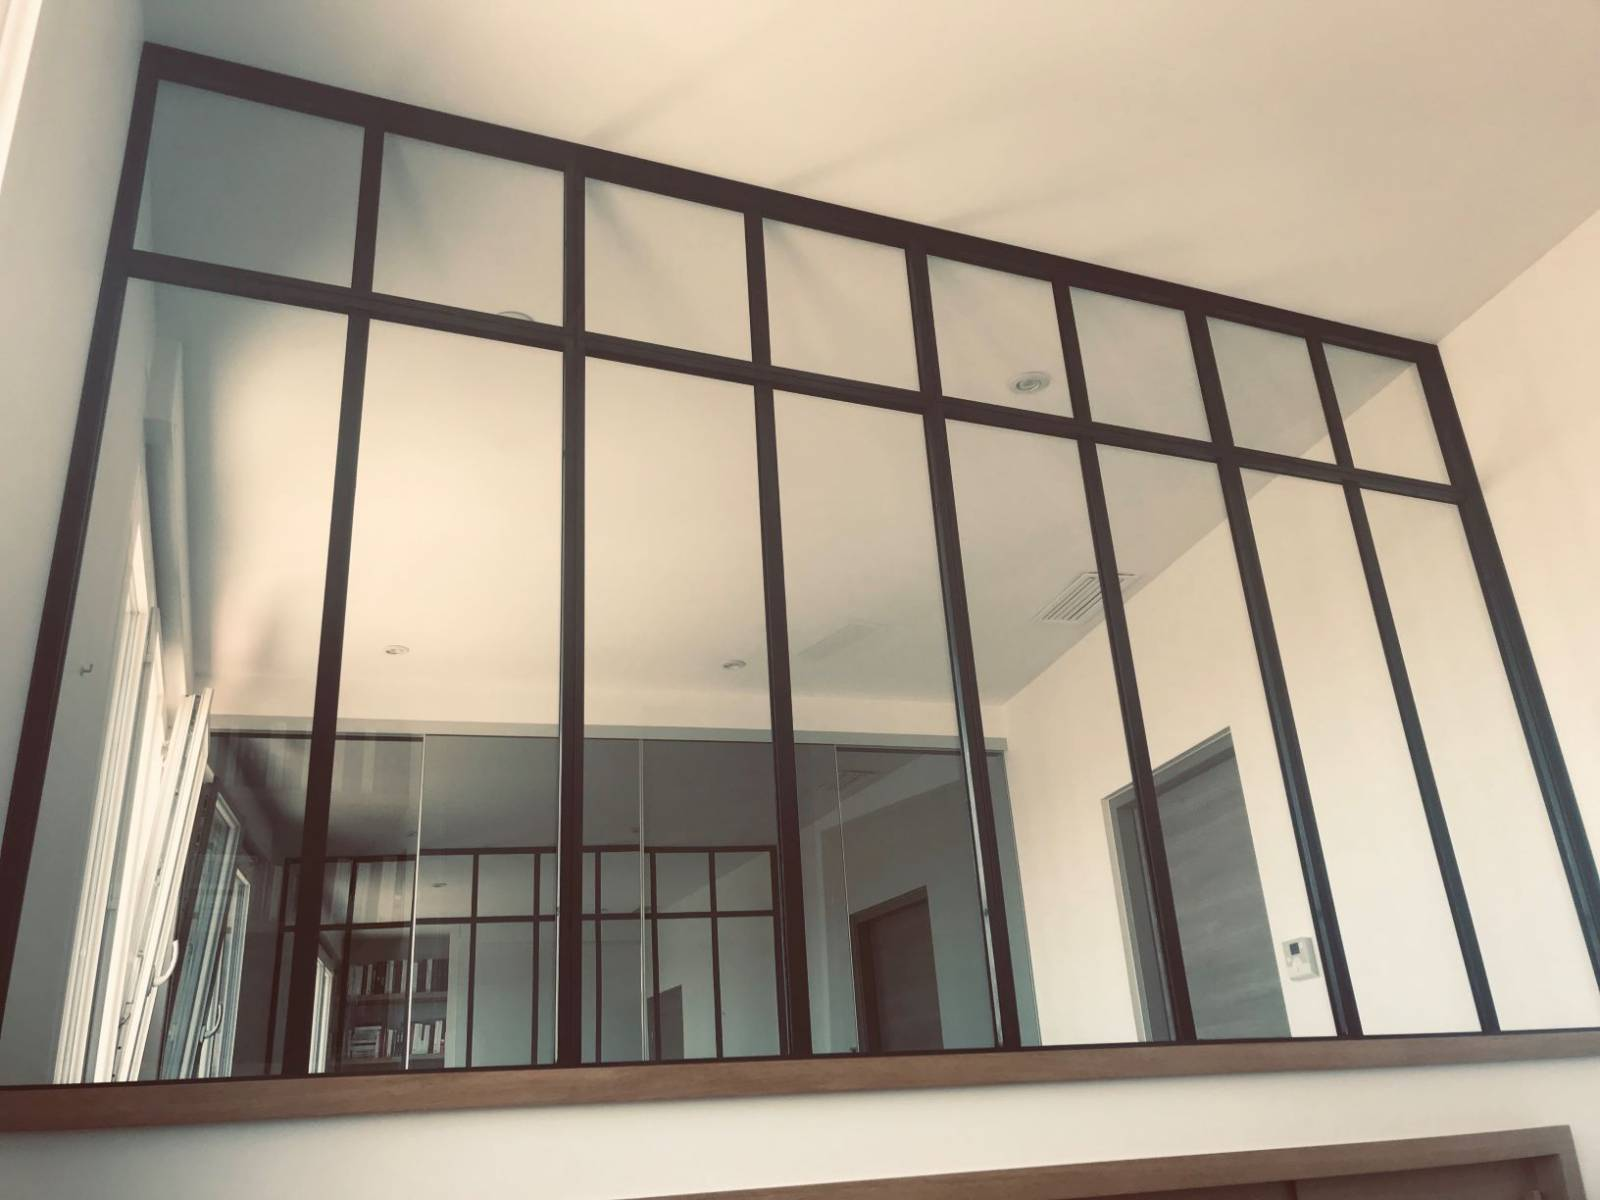 verri re style atelier sur mesure marseille 13008. Black Bedroom Furniture Sets. Home Design Ideas